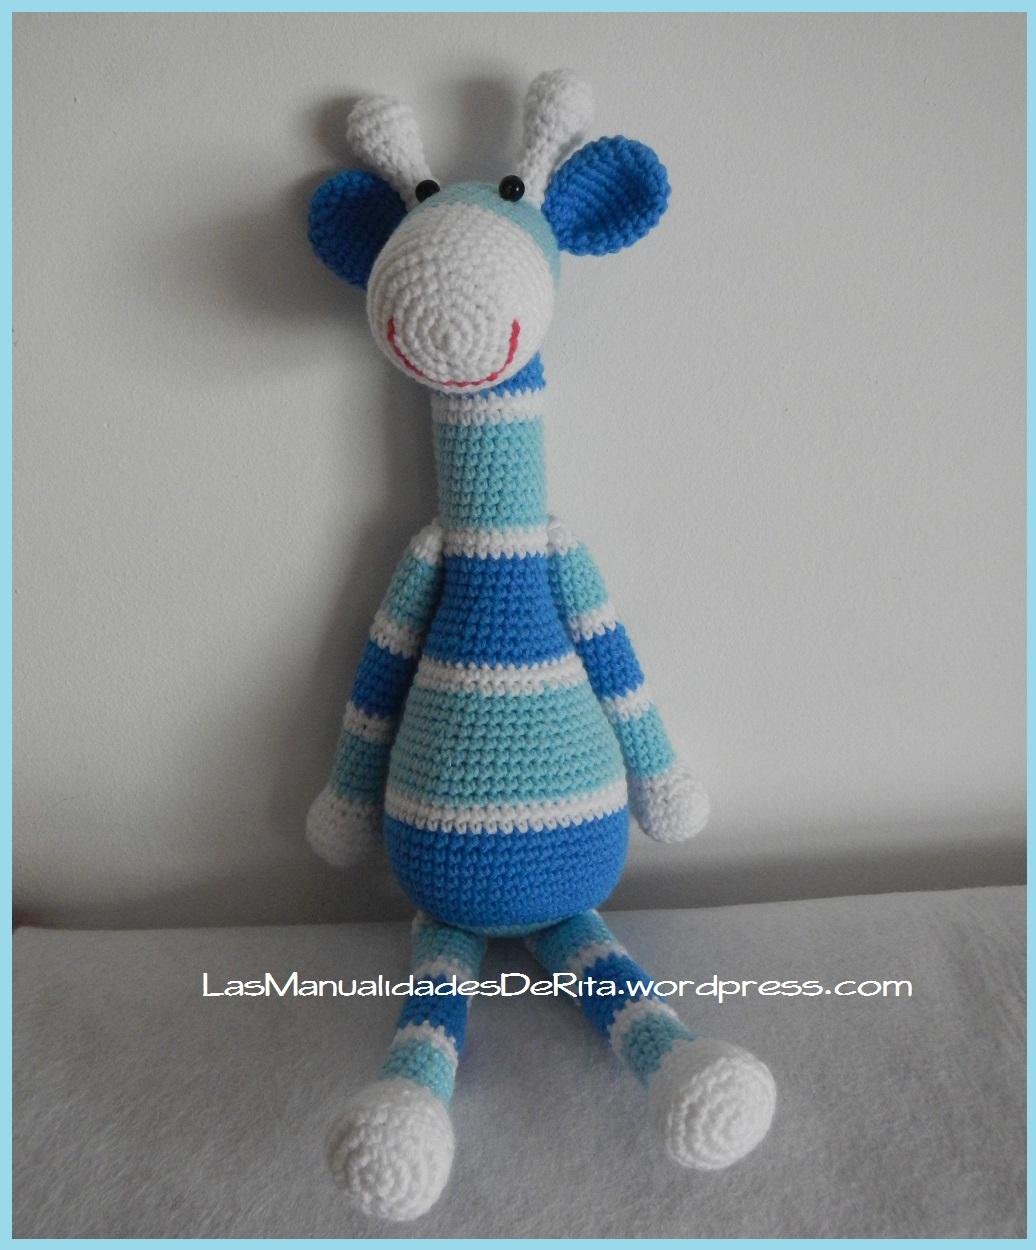 Giraffe baby rattle crochet pattern | Jirafa amigurumi, Patrones ... | 1250x1036